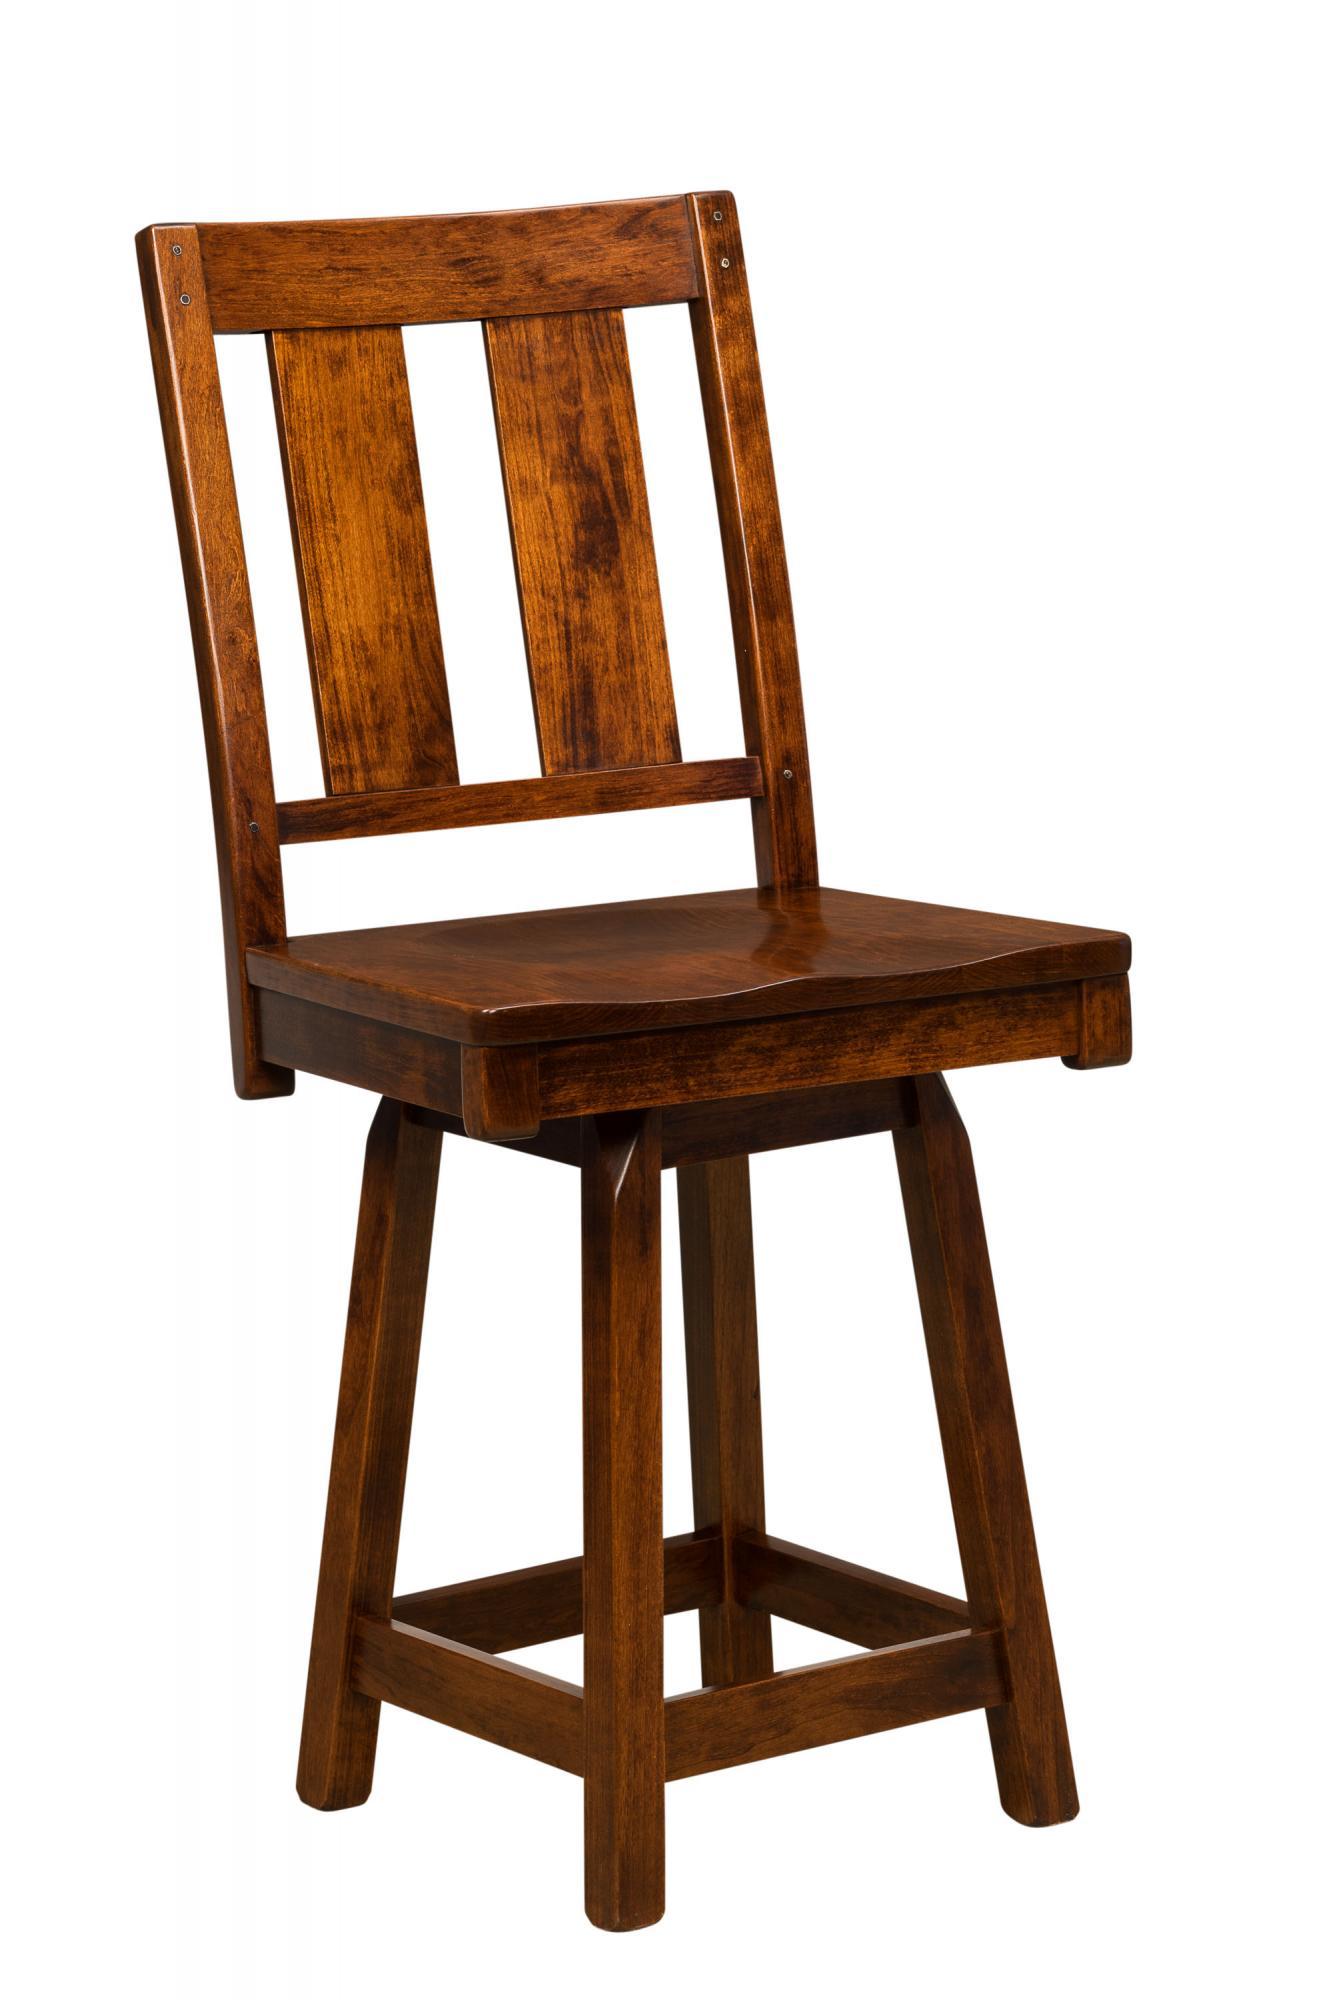 Brunswick Dining Chair Amish Furniture Store Mankato MN : Brunswick20Swivel20Bar20Stool from coveredbridgefurniture.com size 1333 x 2000 jpeg 162kB